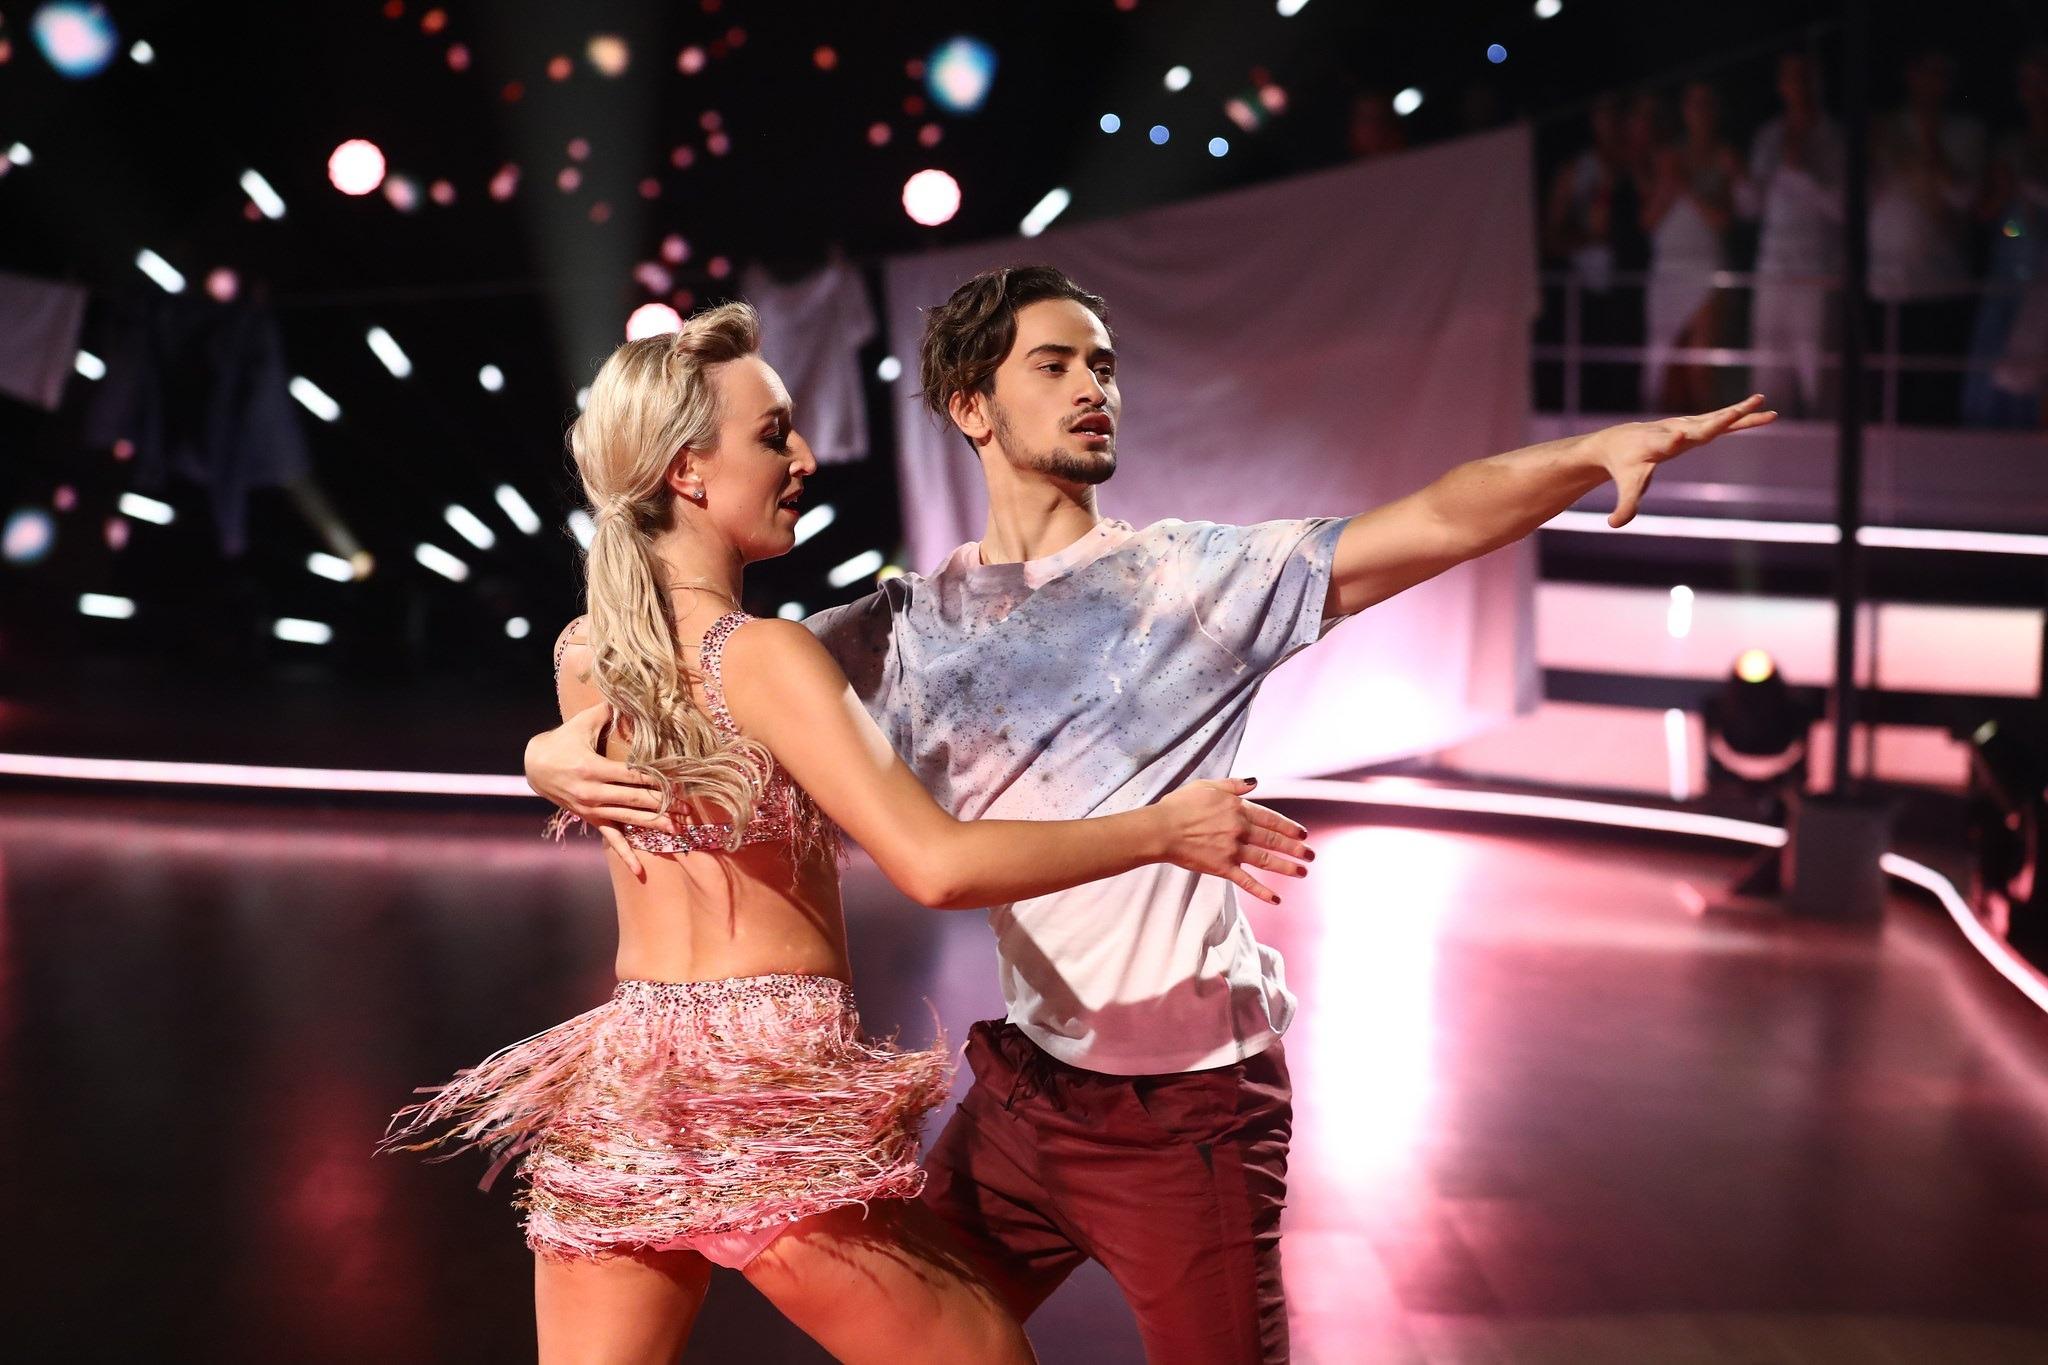 danser med stjernene par dating dating kart og Globes